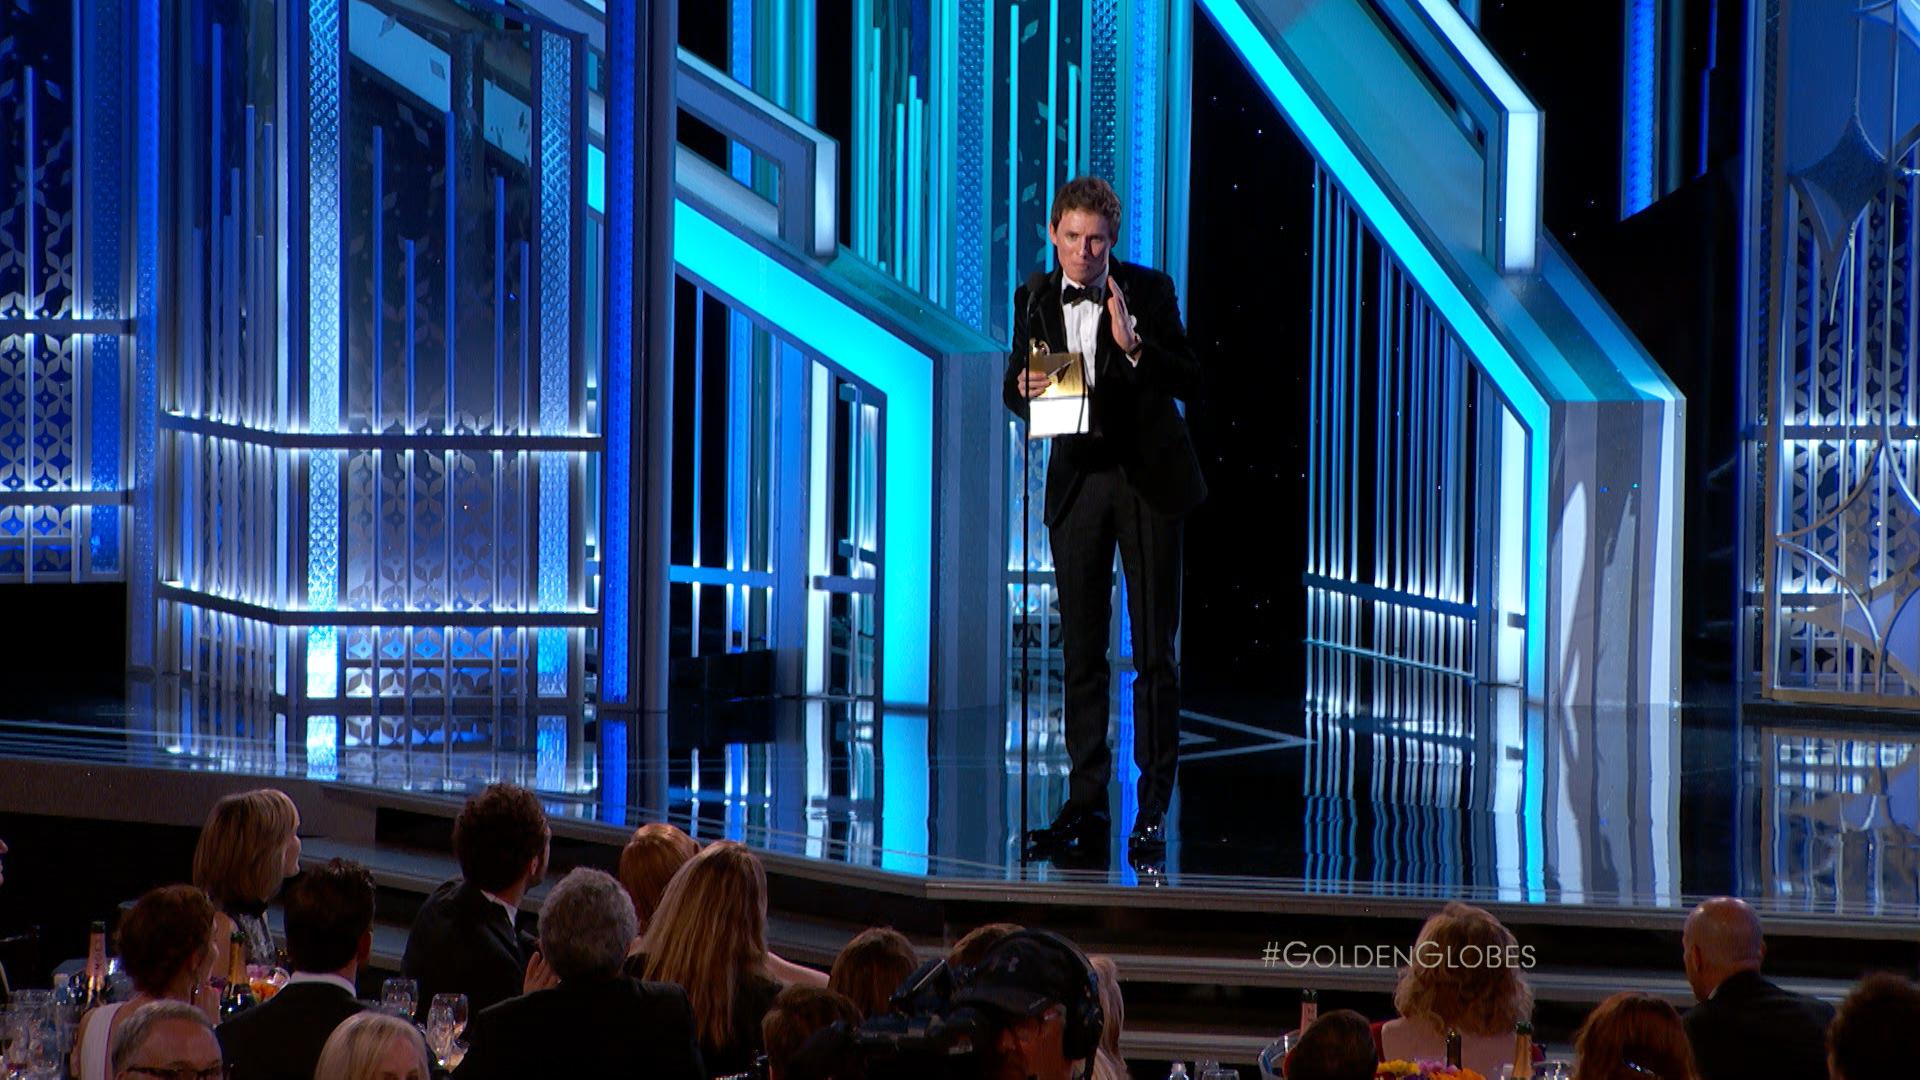 Golden Globes (1).jpg